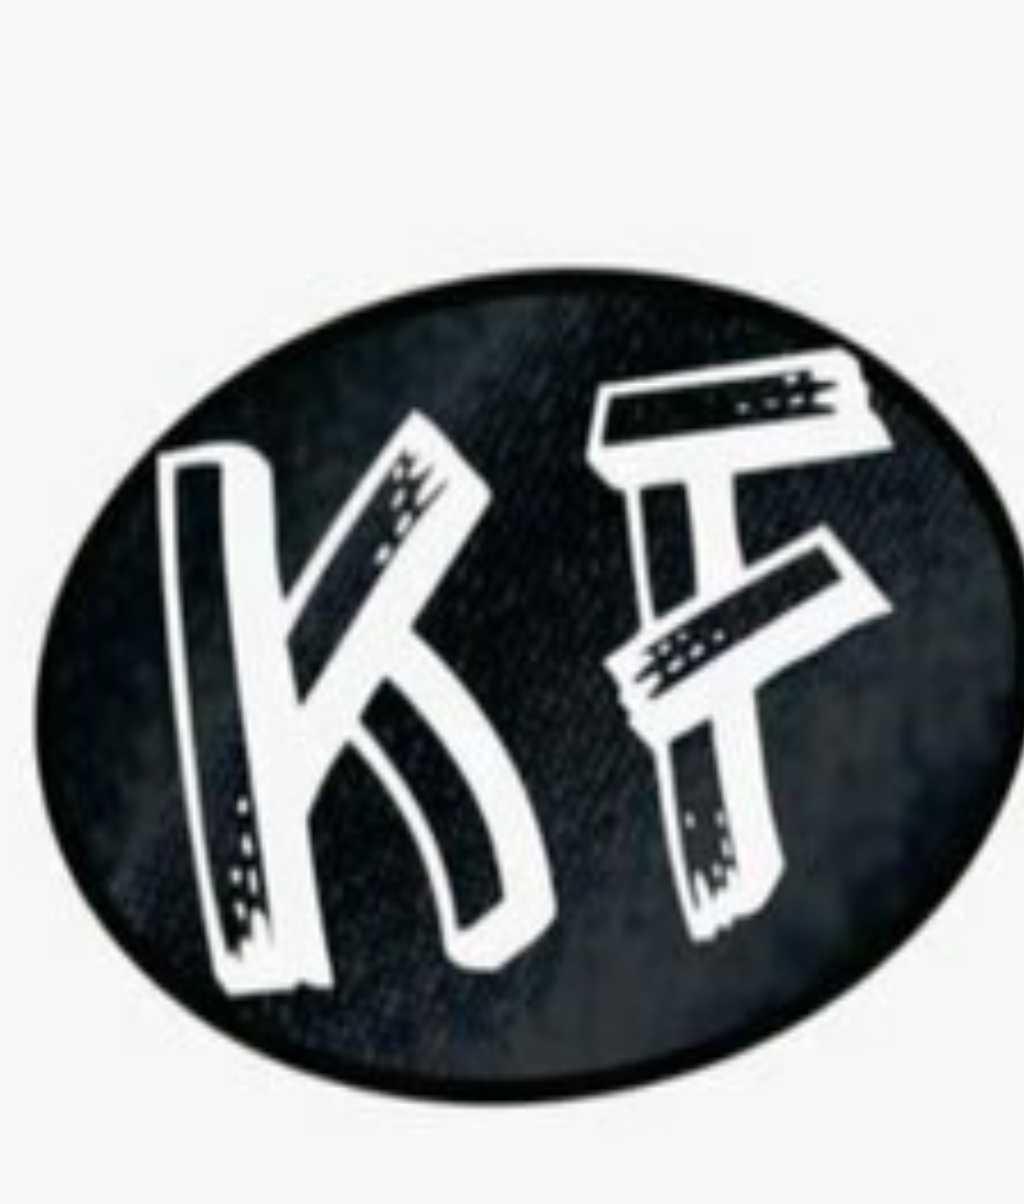 Kanha Fashion Industry